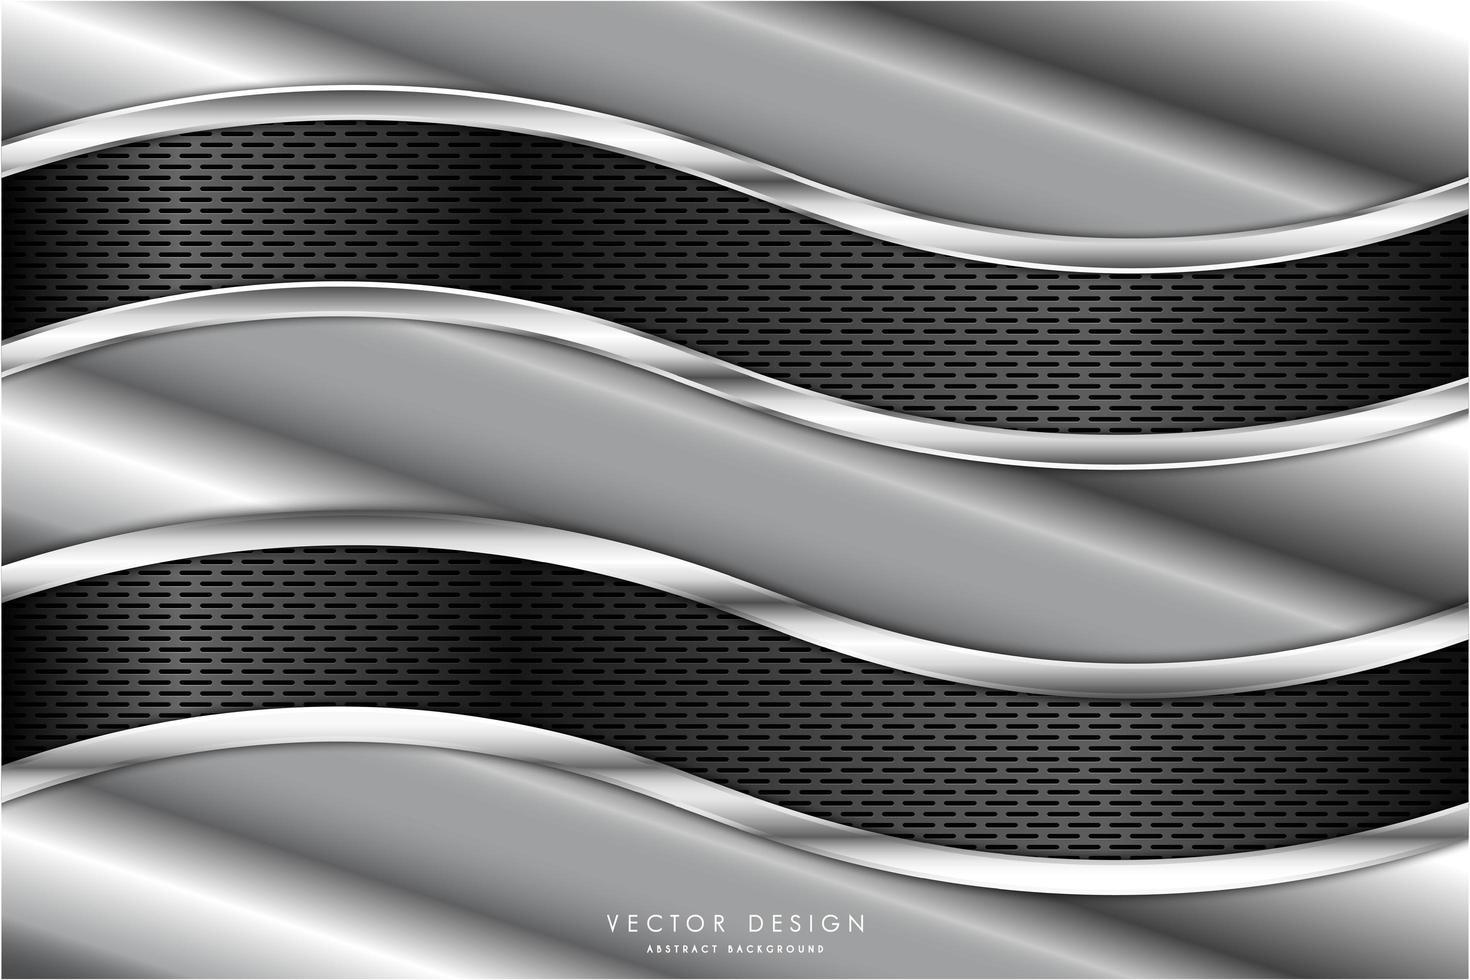 Metallic angled textures with wavy carbon fiber panels vector